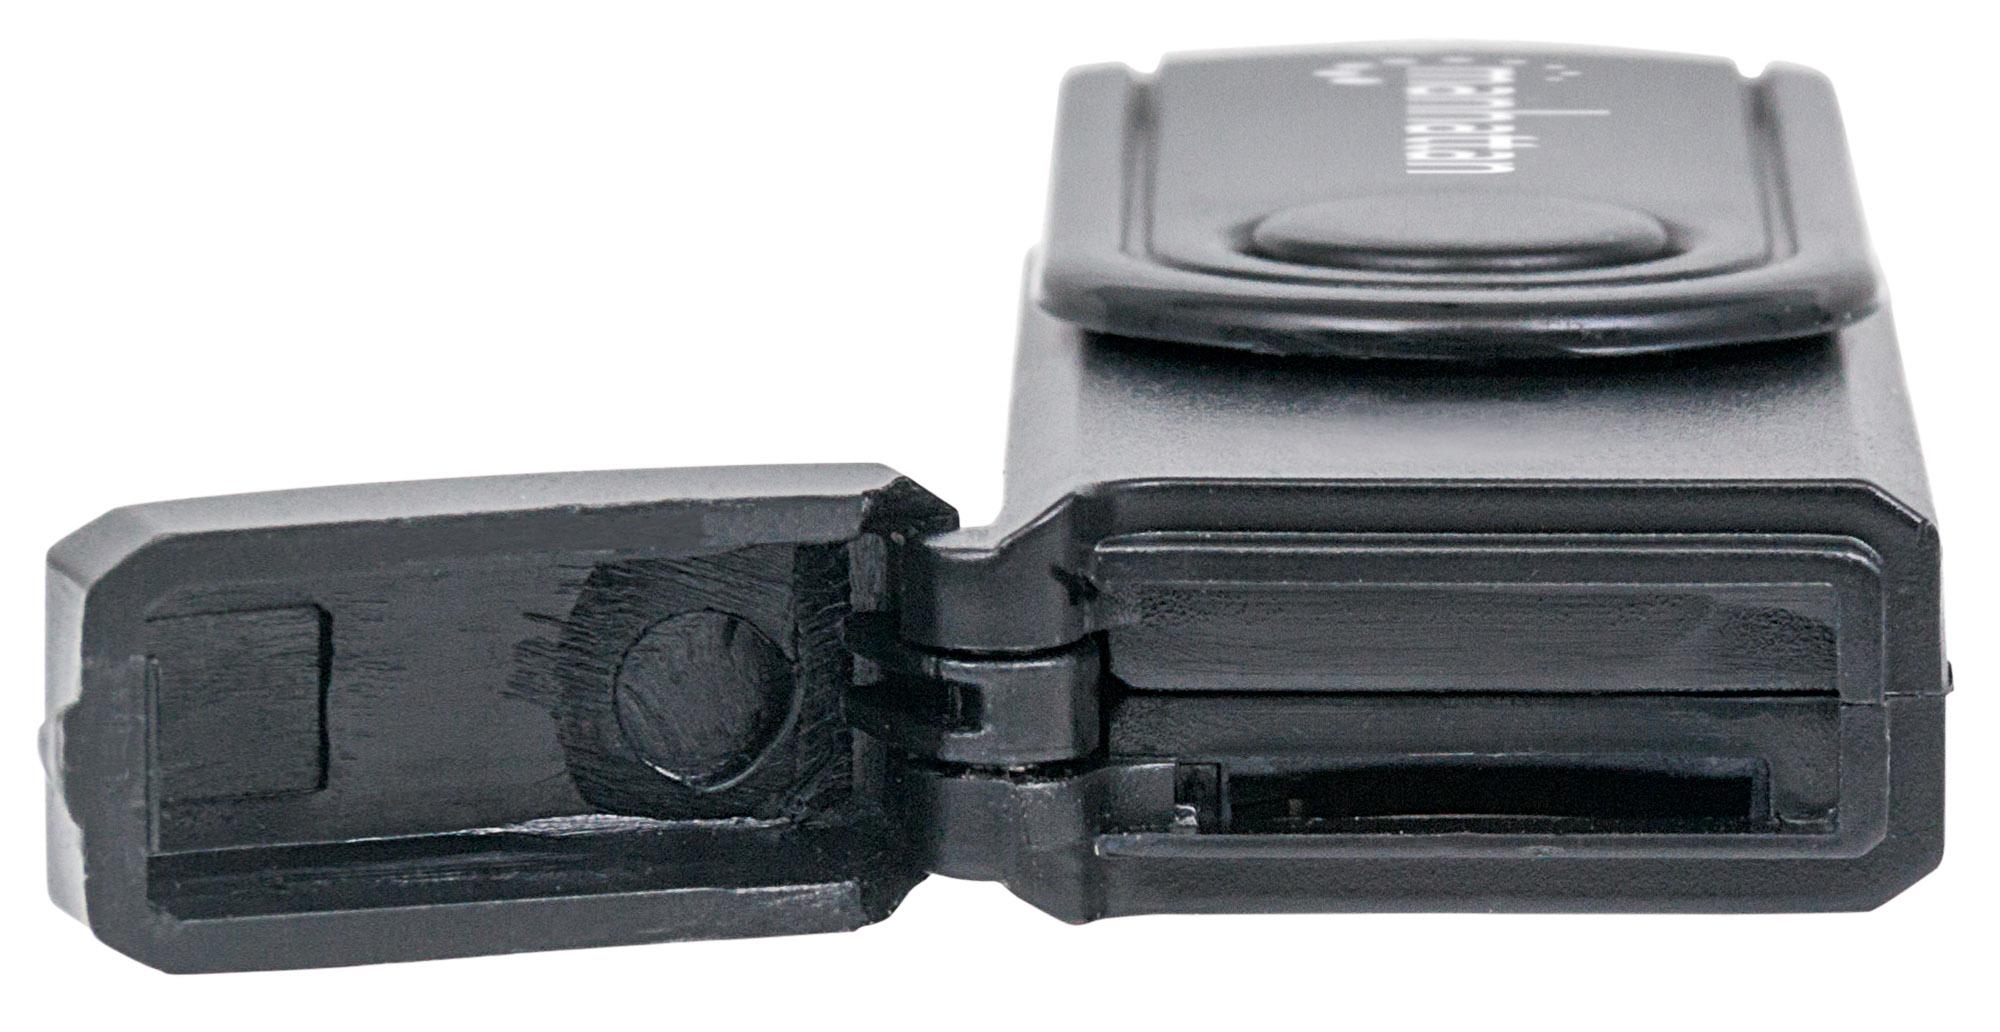 Mini Multi-Card Reader/Writer